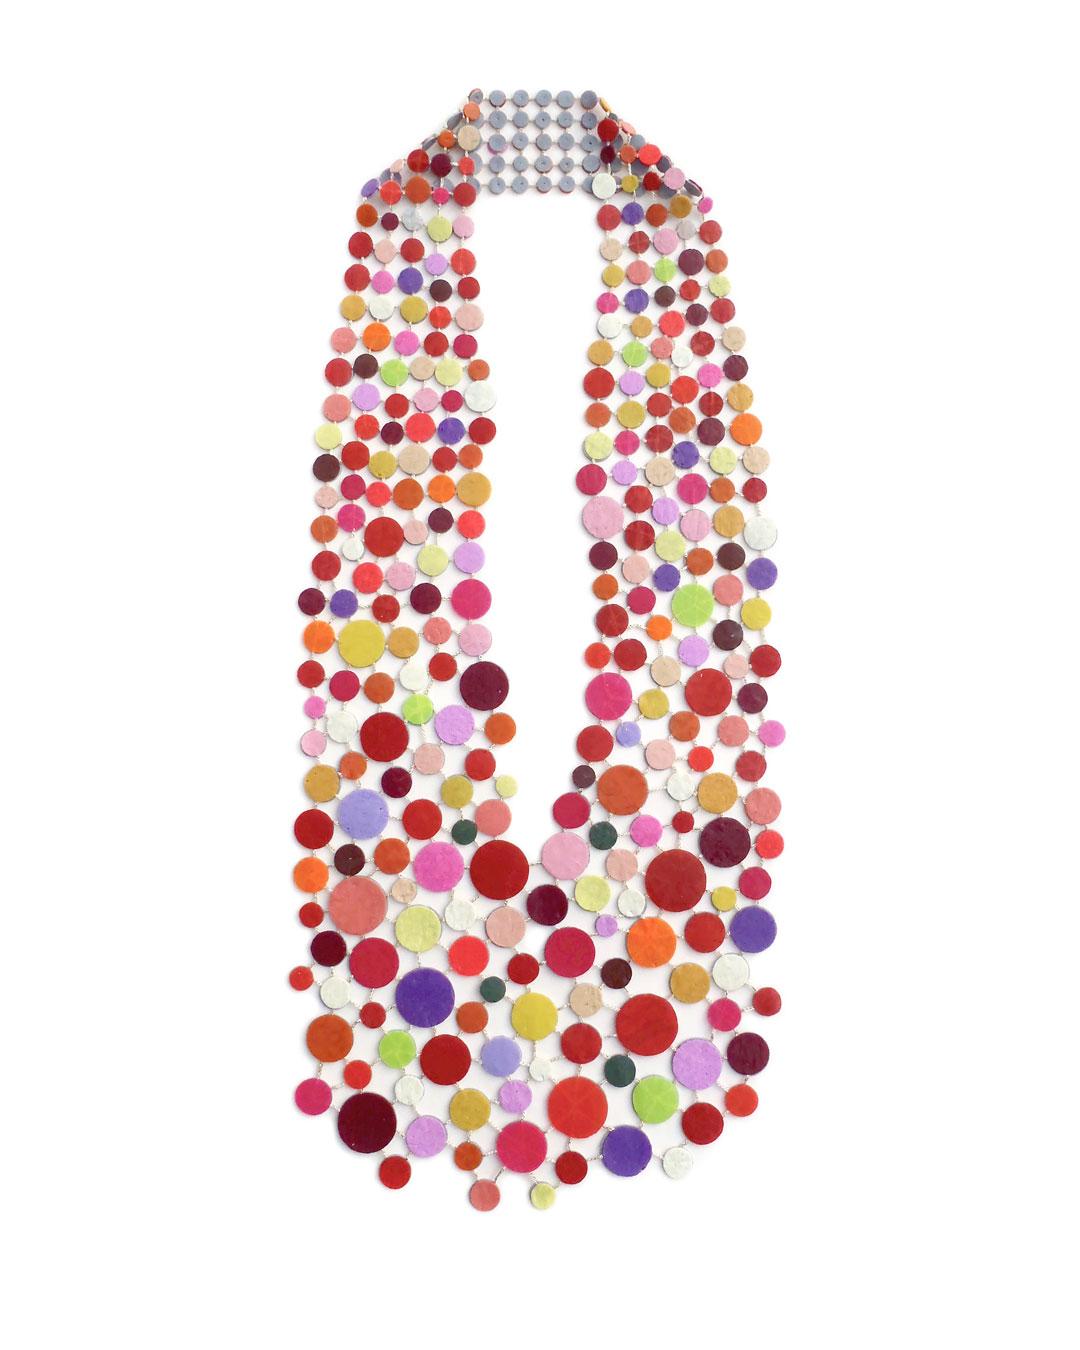 Karola Torkos, Untitled II, 2016, necklace; plastic, glitter, textile thread, 650 x 250 mm, €2200